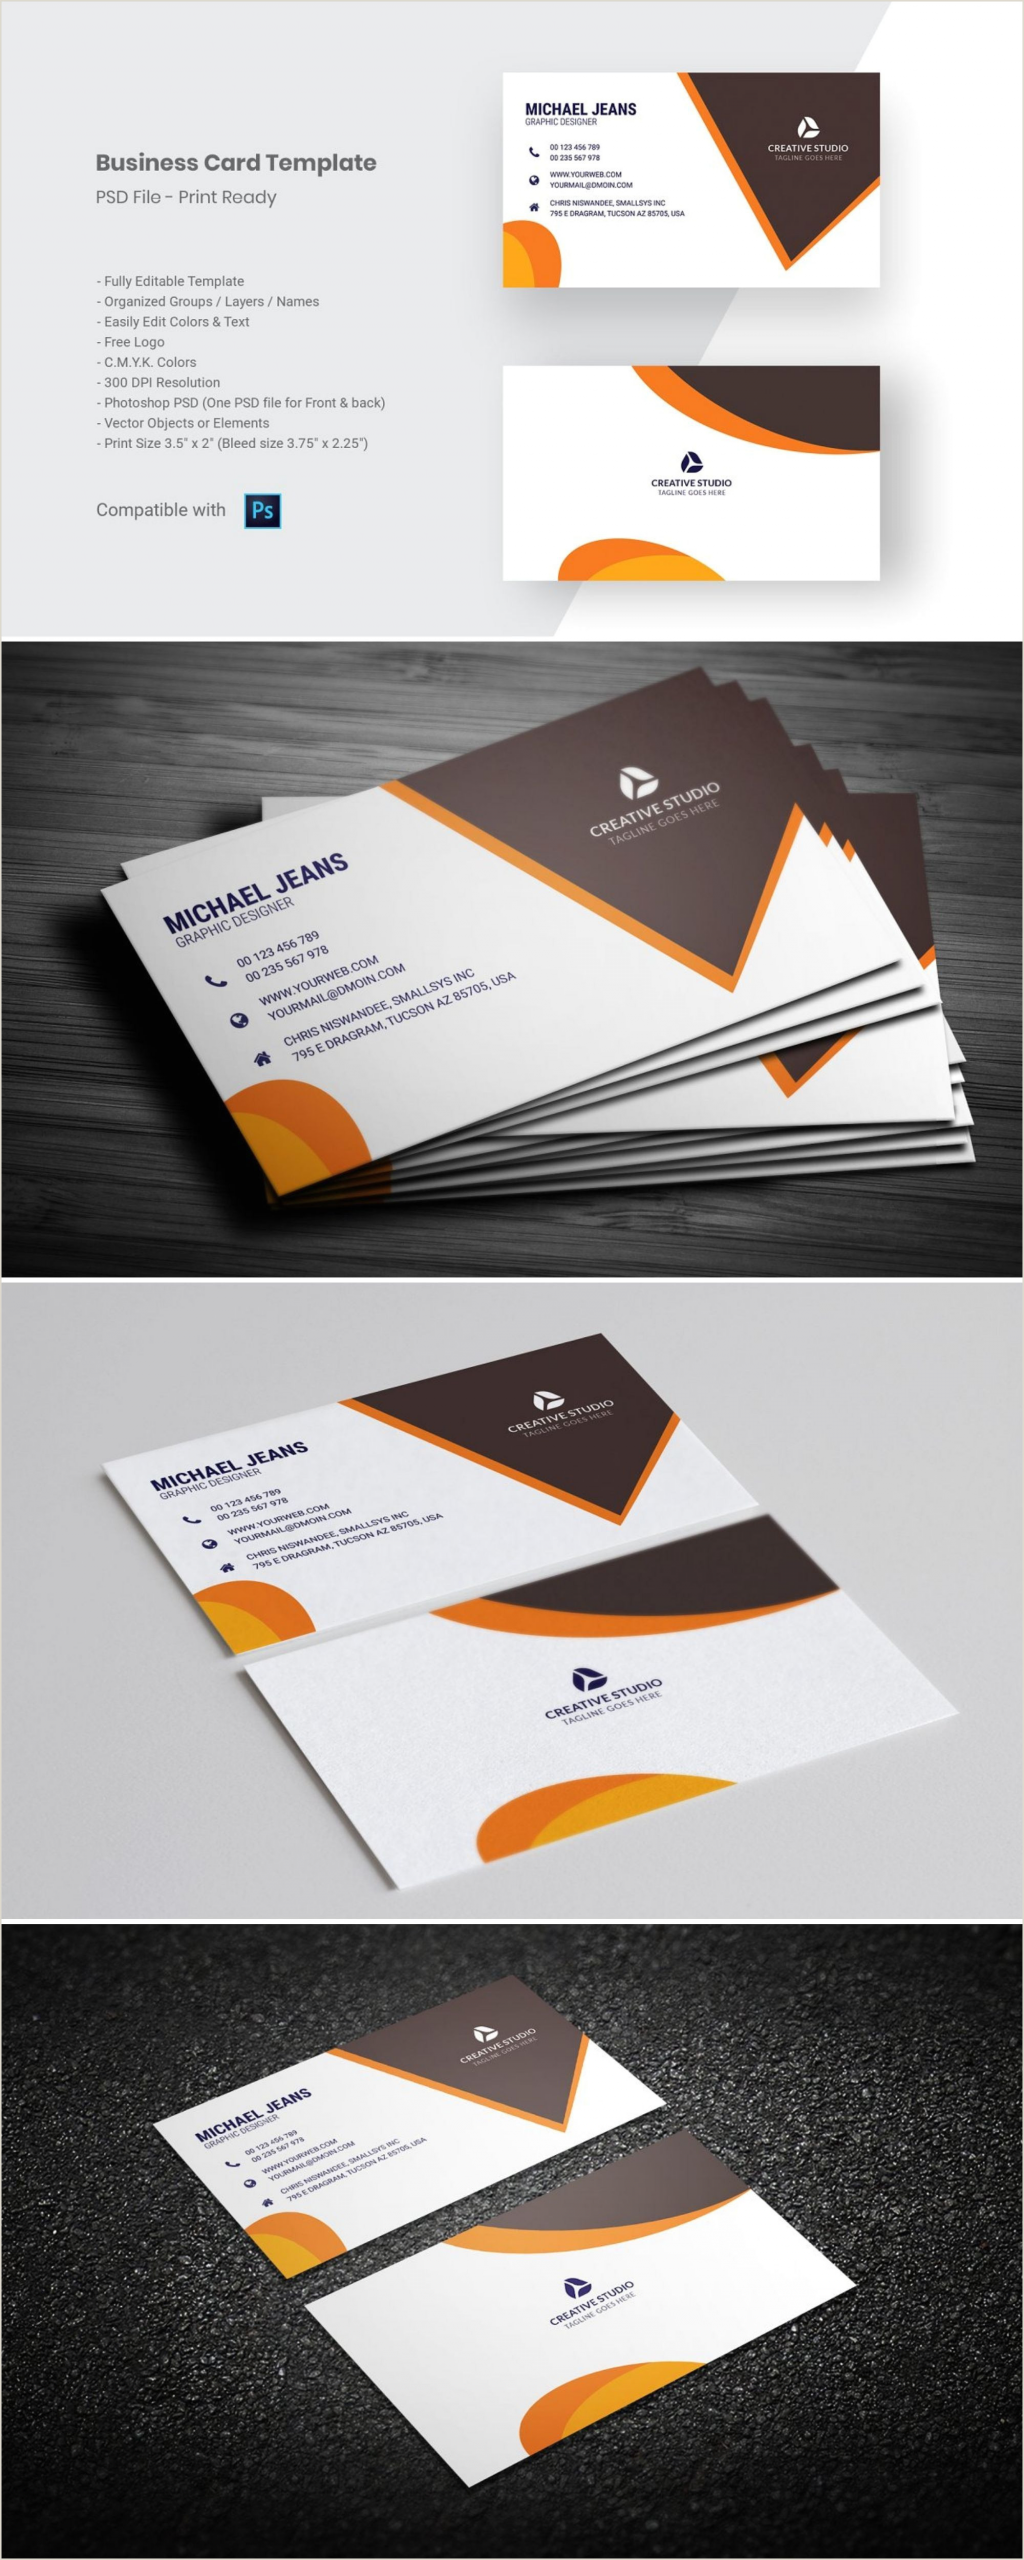 Business Cards Designs Template Modern Business Card Template